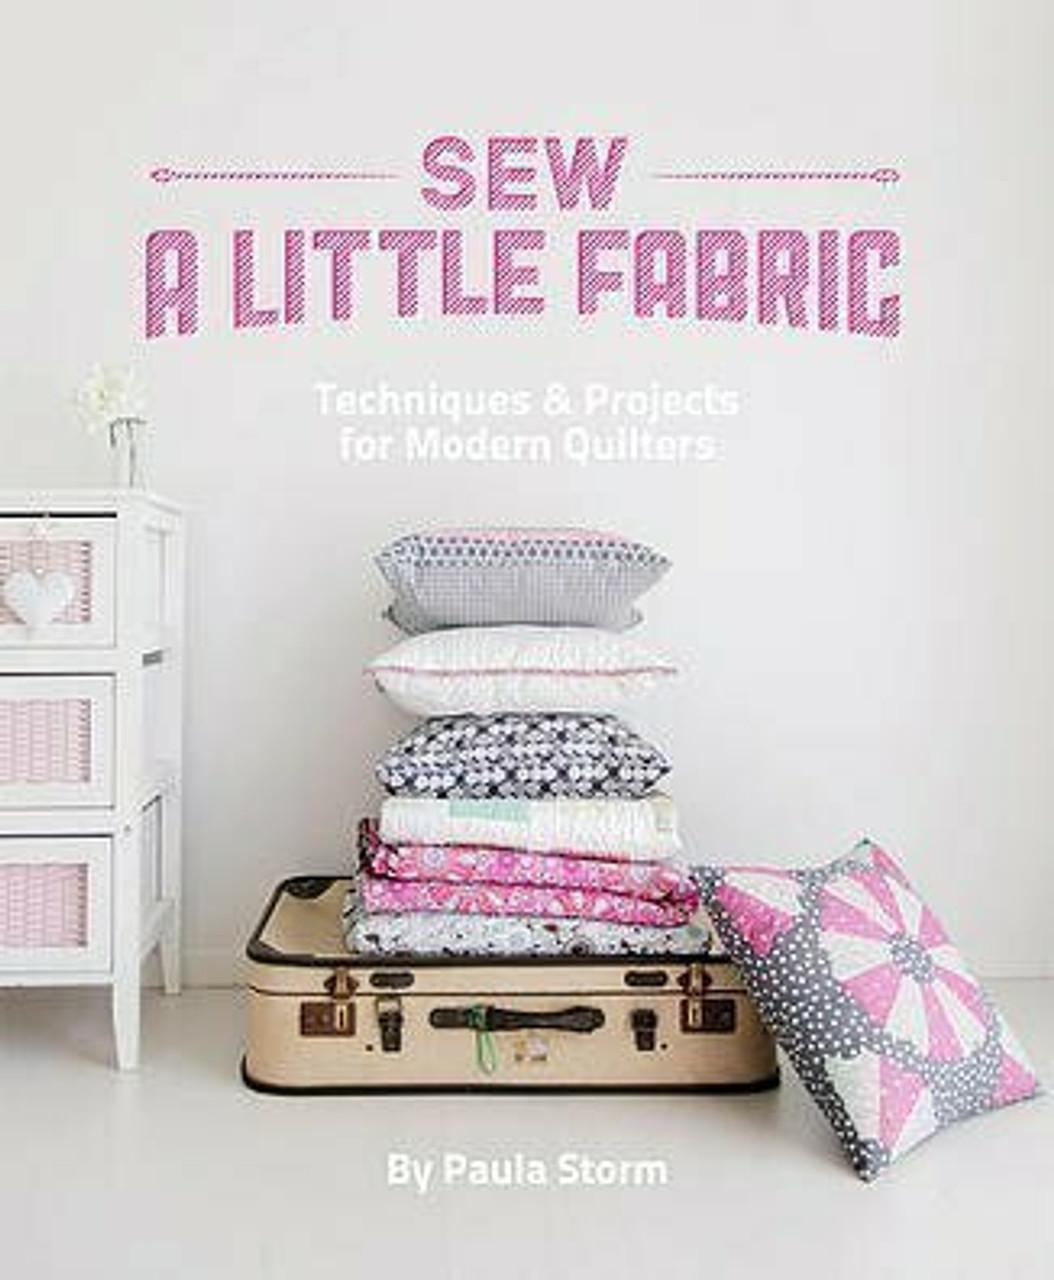 Sew a Little Fabric